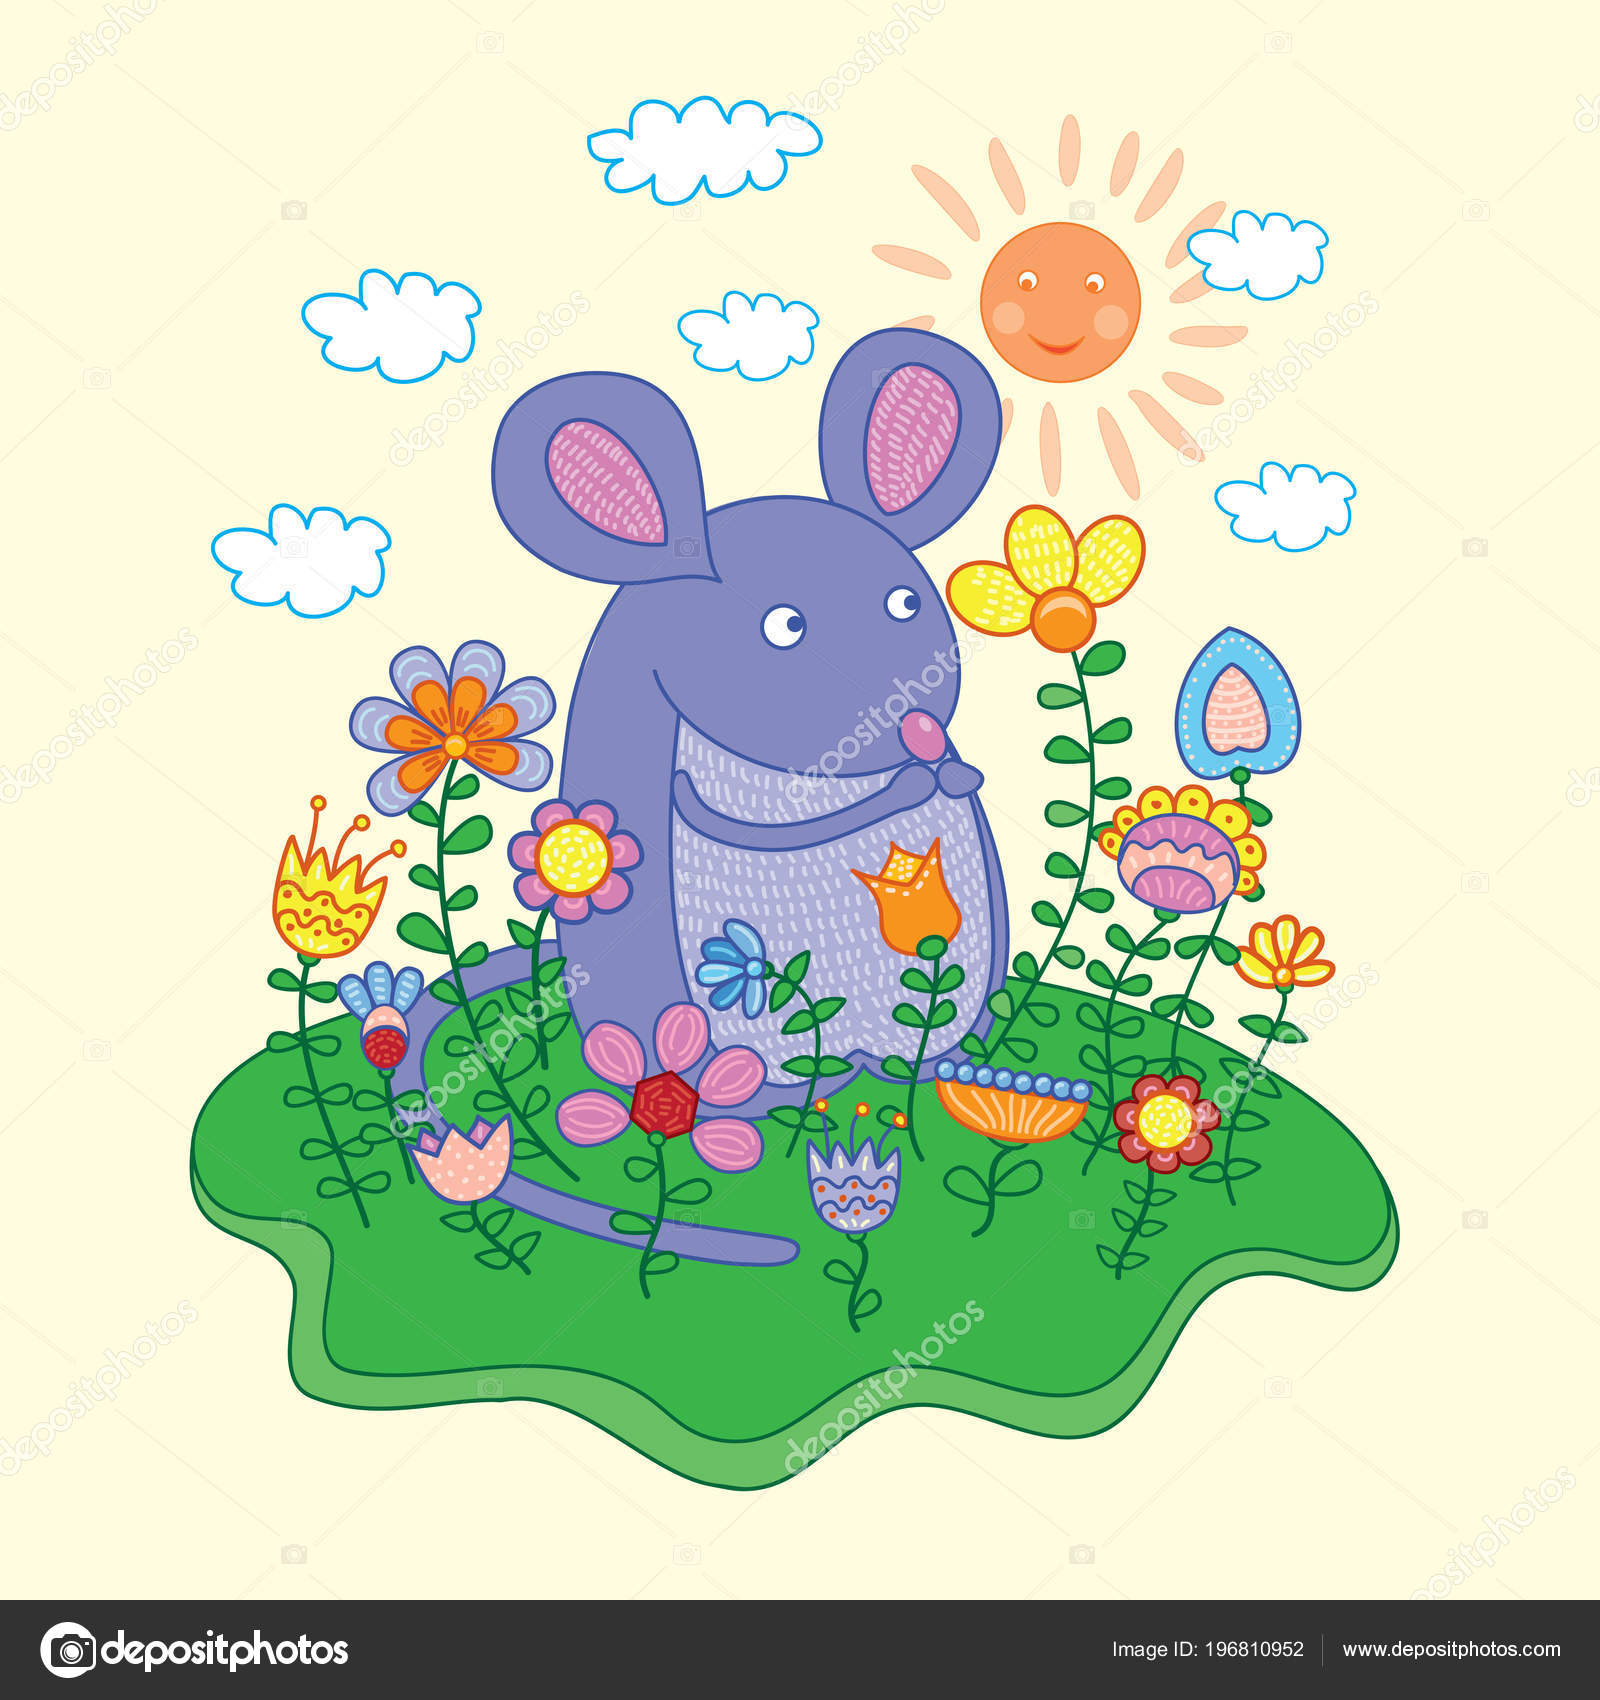 Lustige Maus Mit Blumen — Stockvektor © ARTBALANCE #196810952